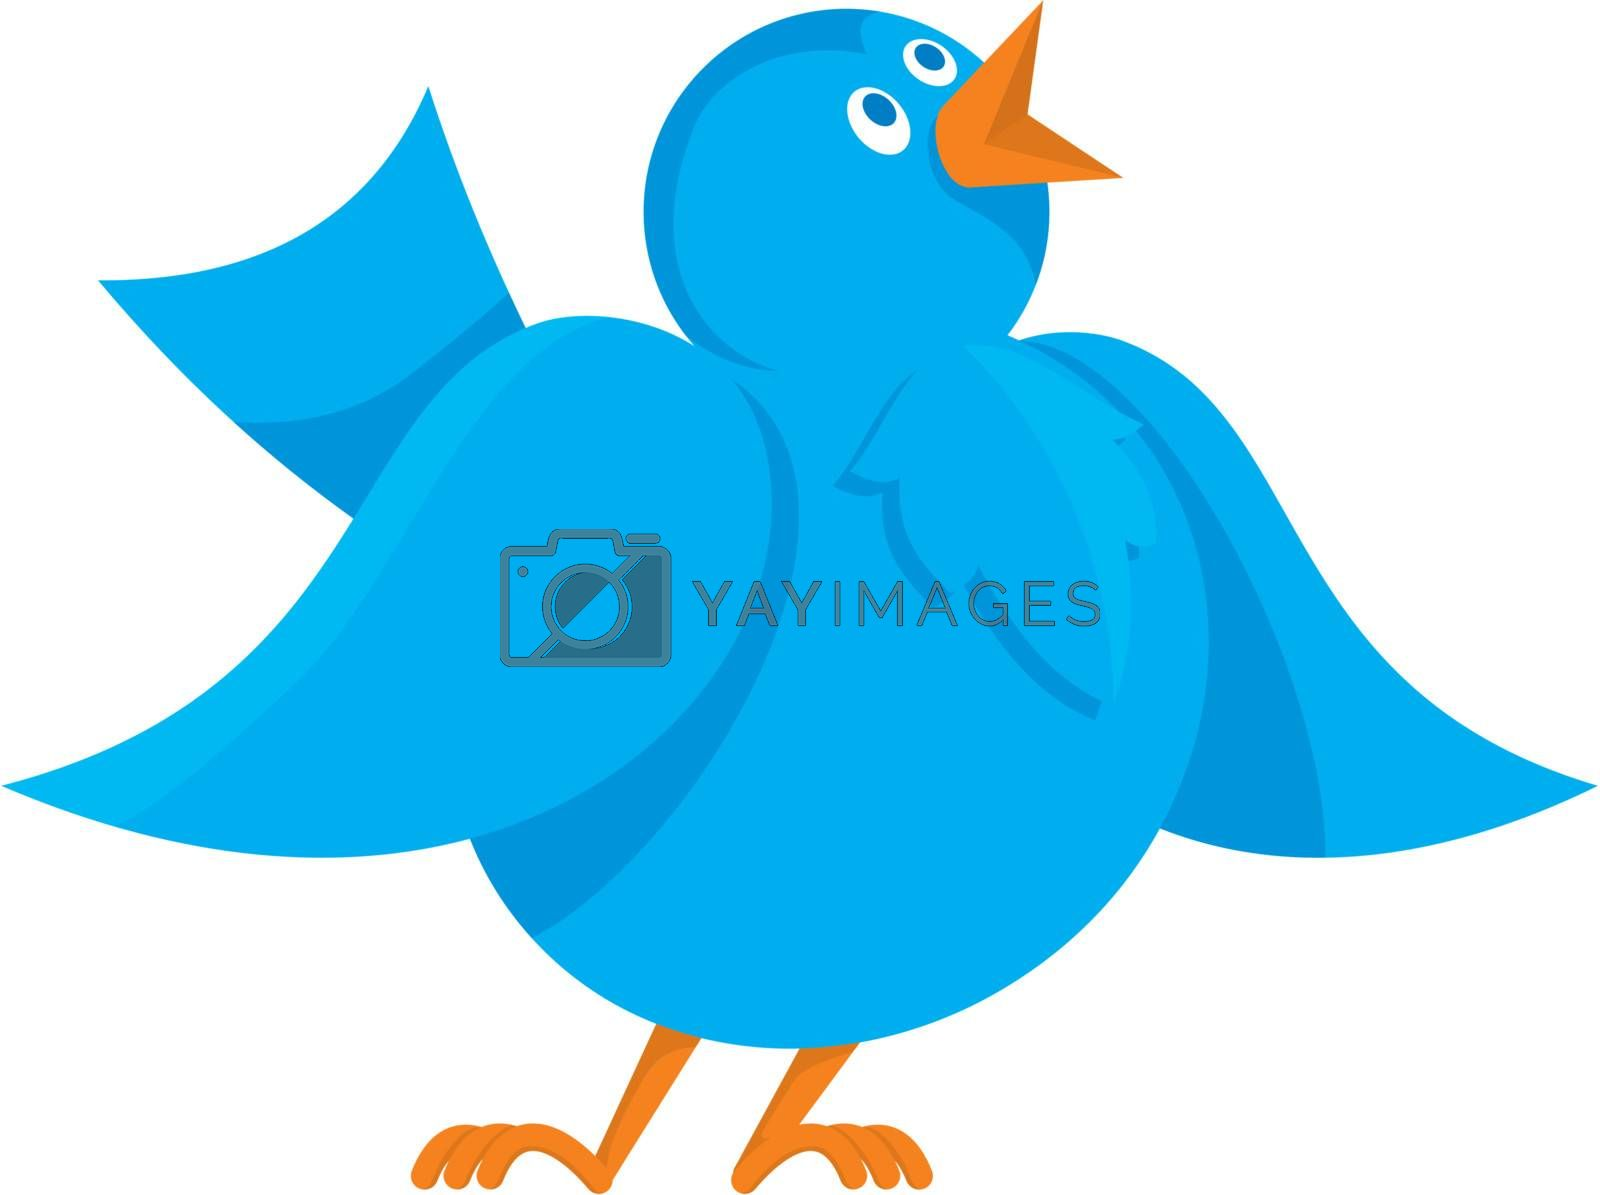 Cartoon illustration of funny cheerful blue bird communicating